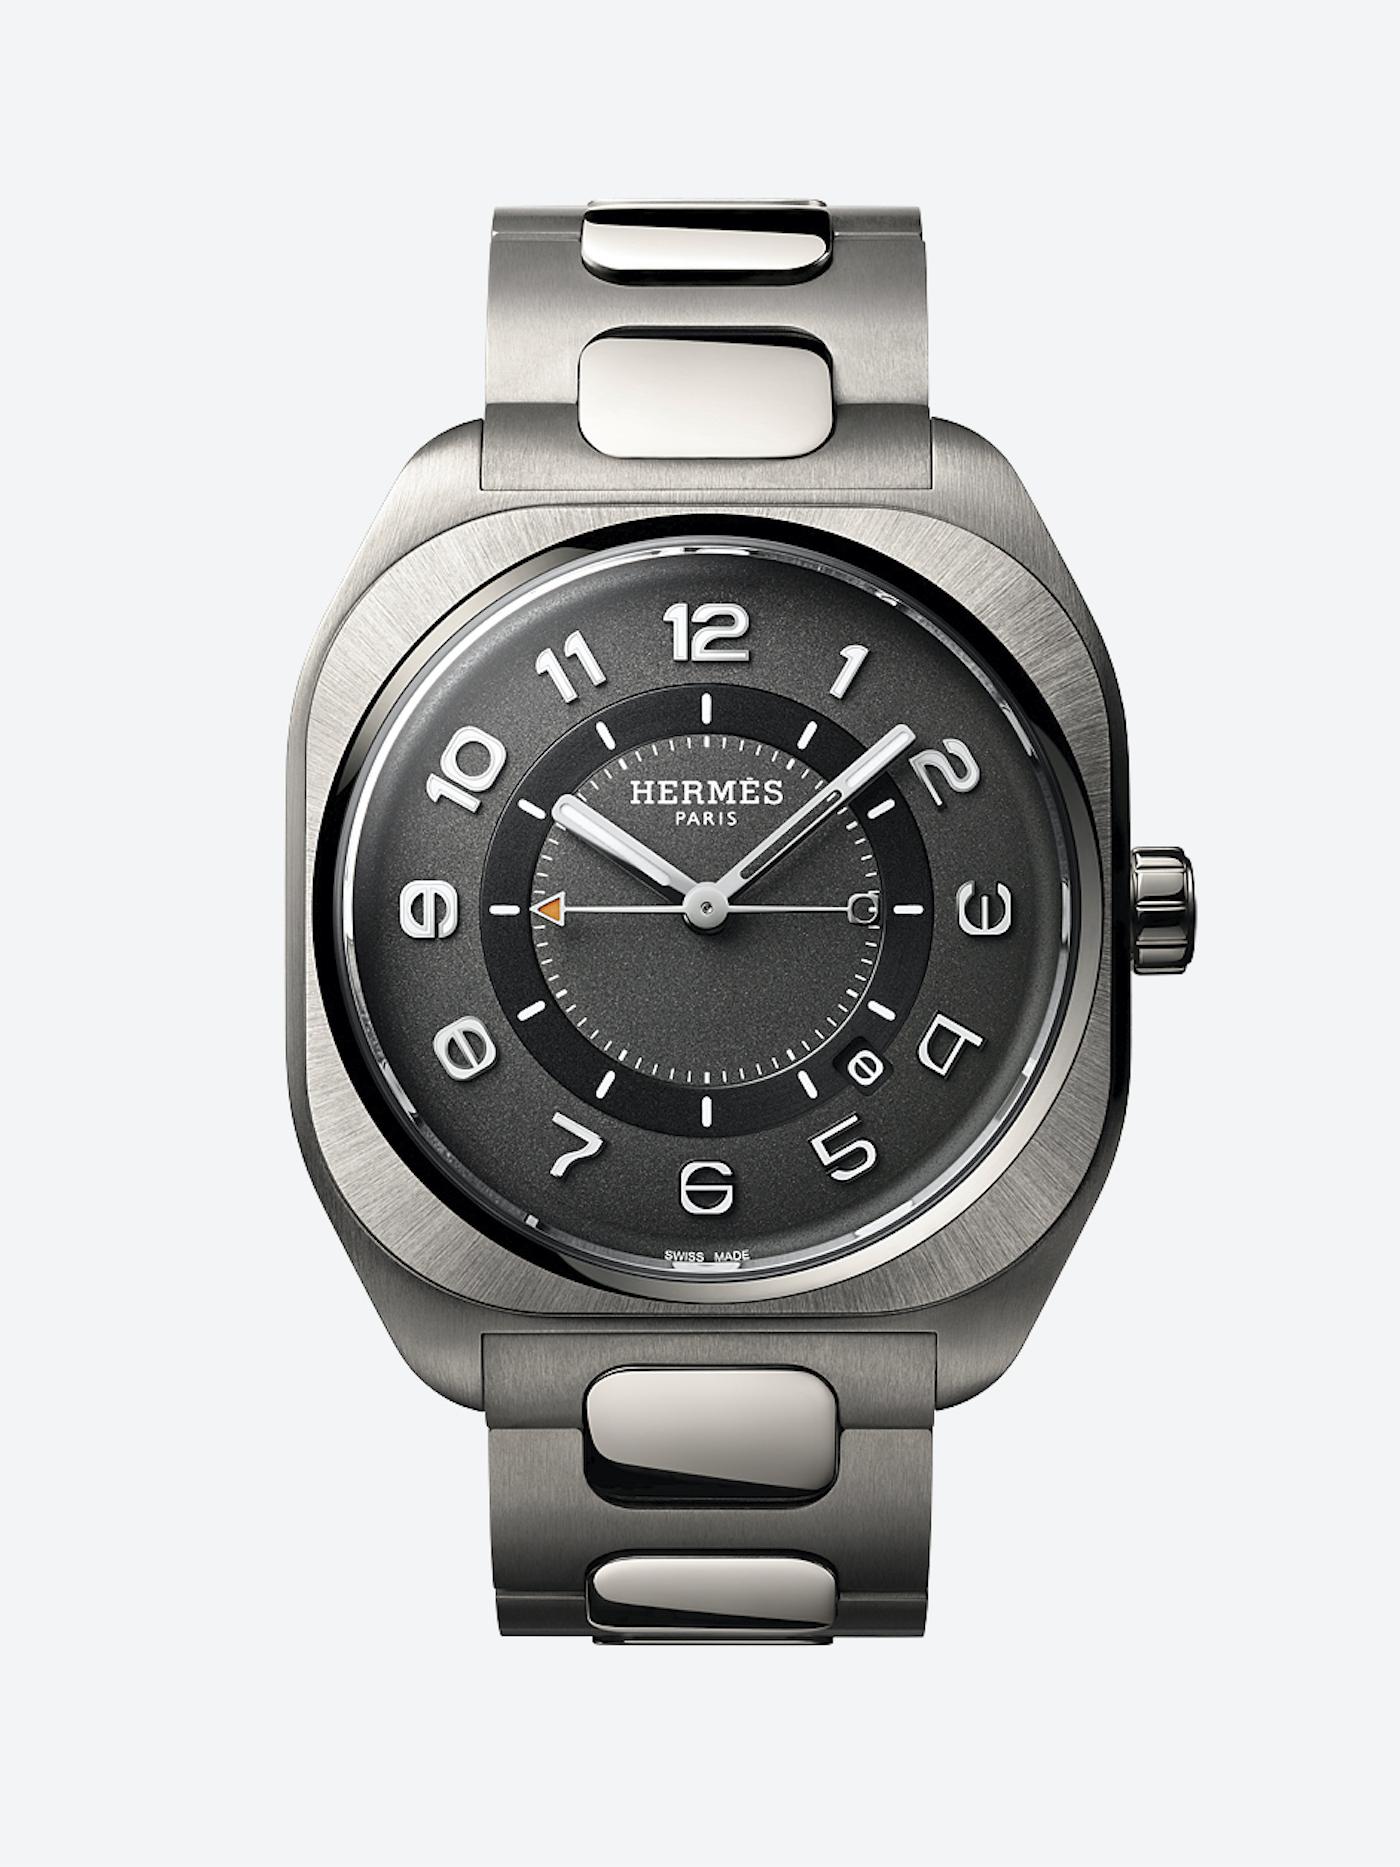 Hermès H08 watches